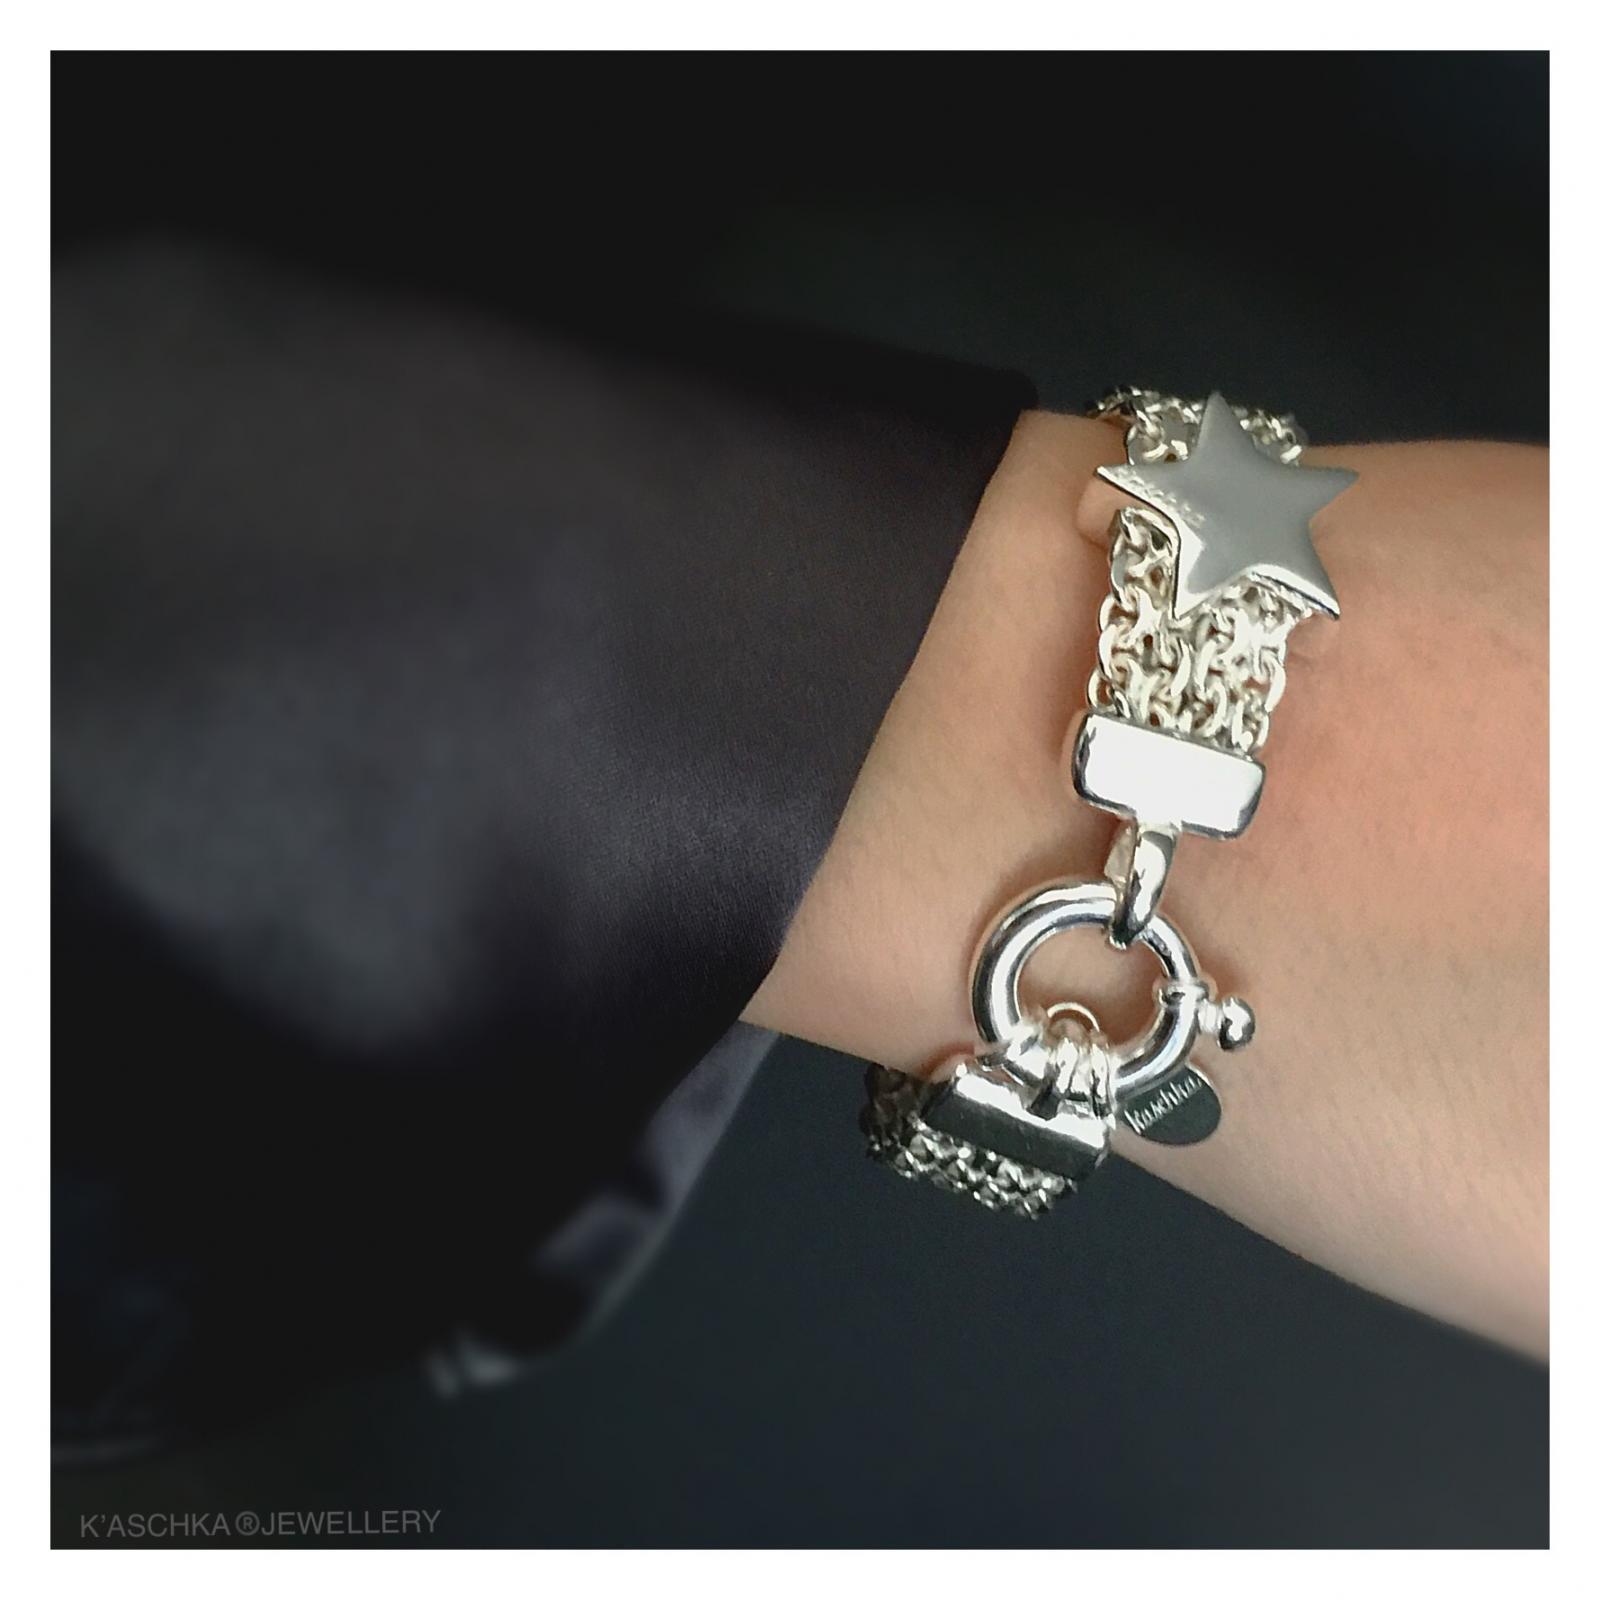 Massief 925 sterling zilveren armband met ster